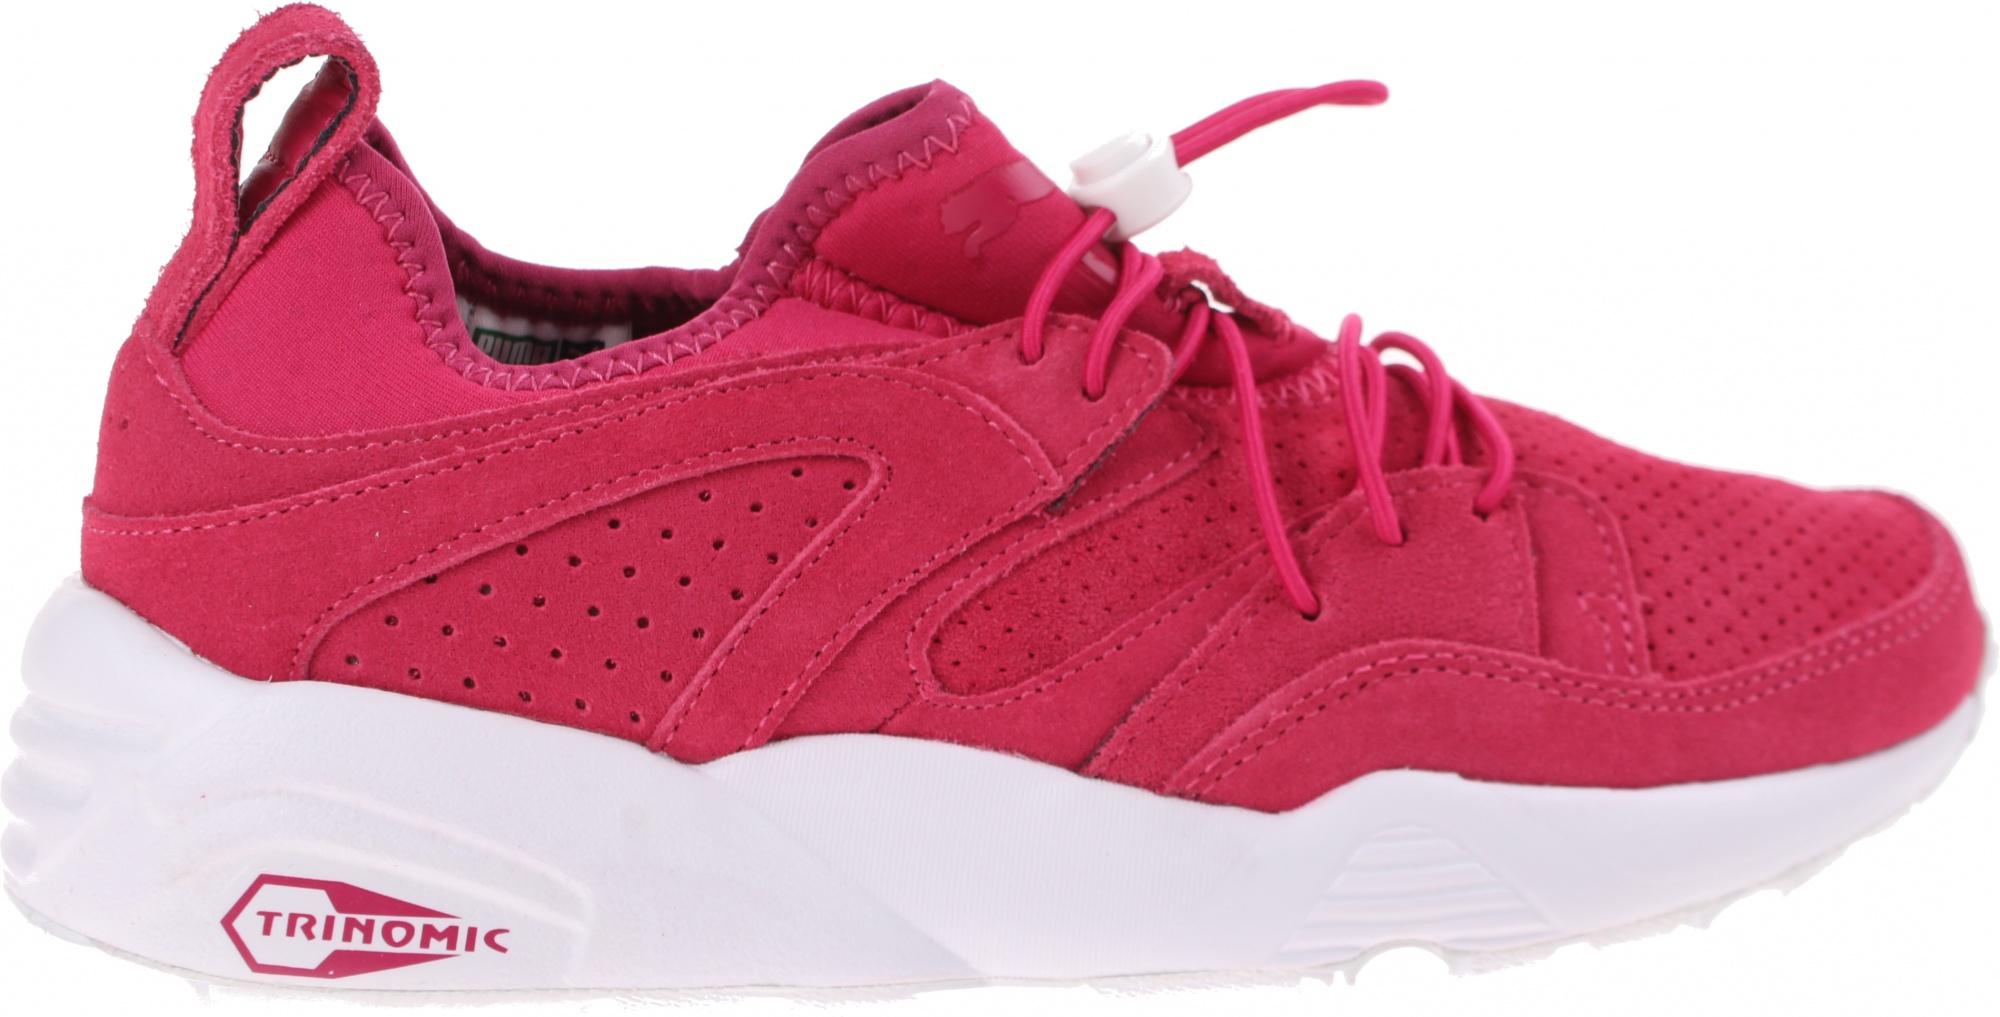 1401379d5f9 Puma sneakers Blaze of Glory Soft roze dames - Internet-Sport&Casuals